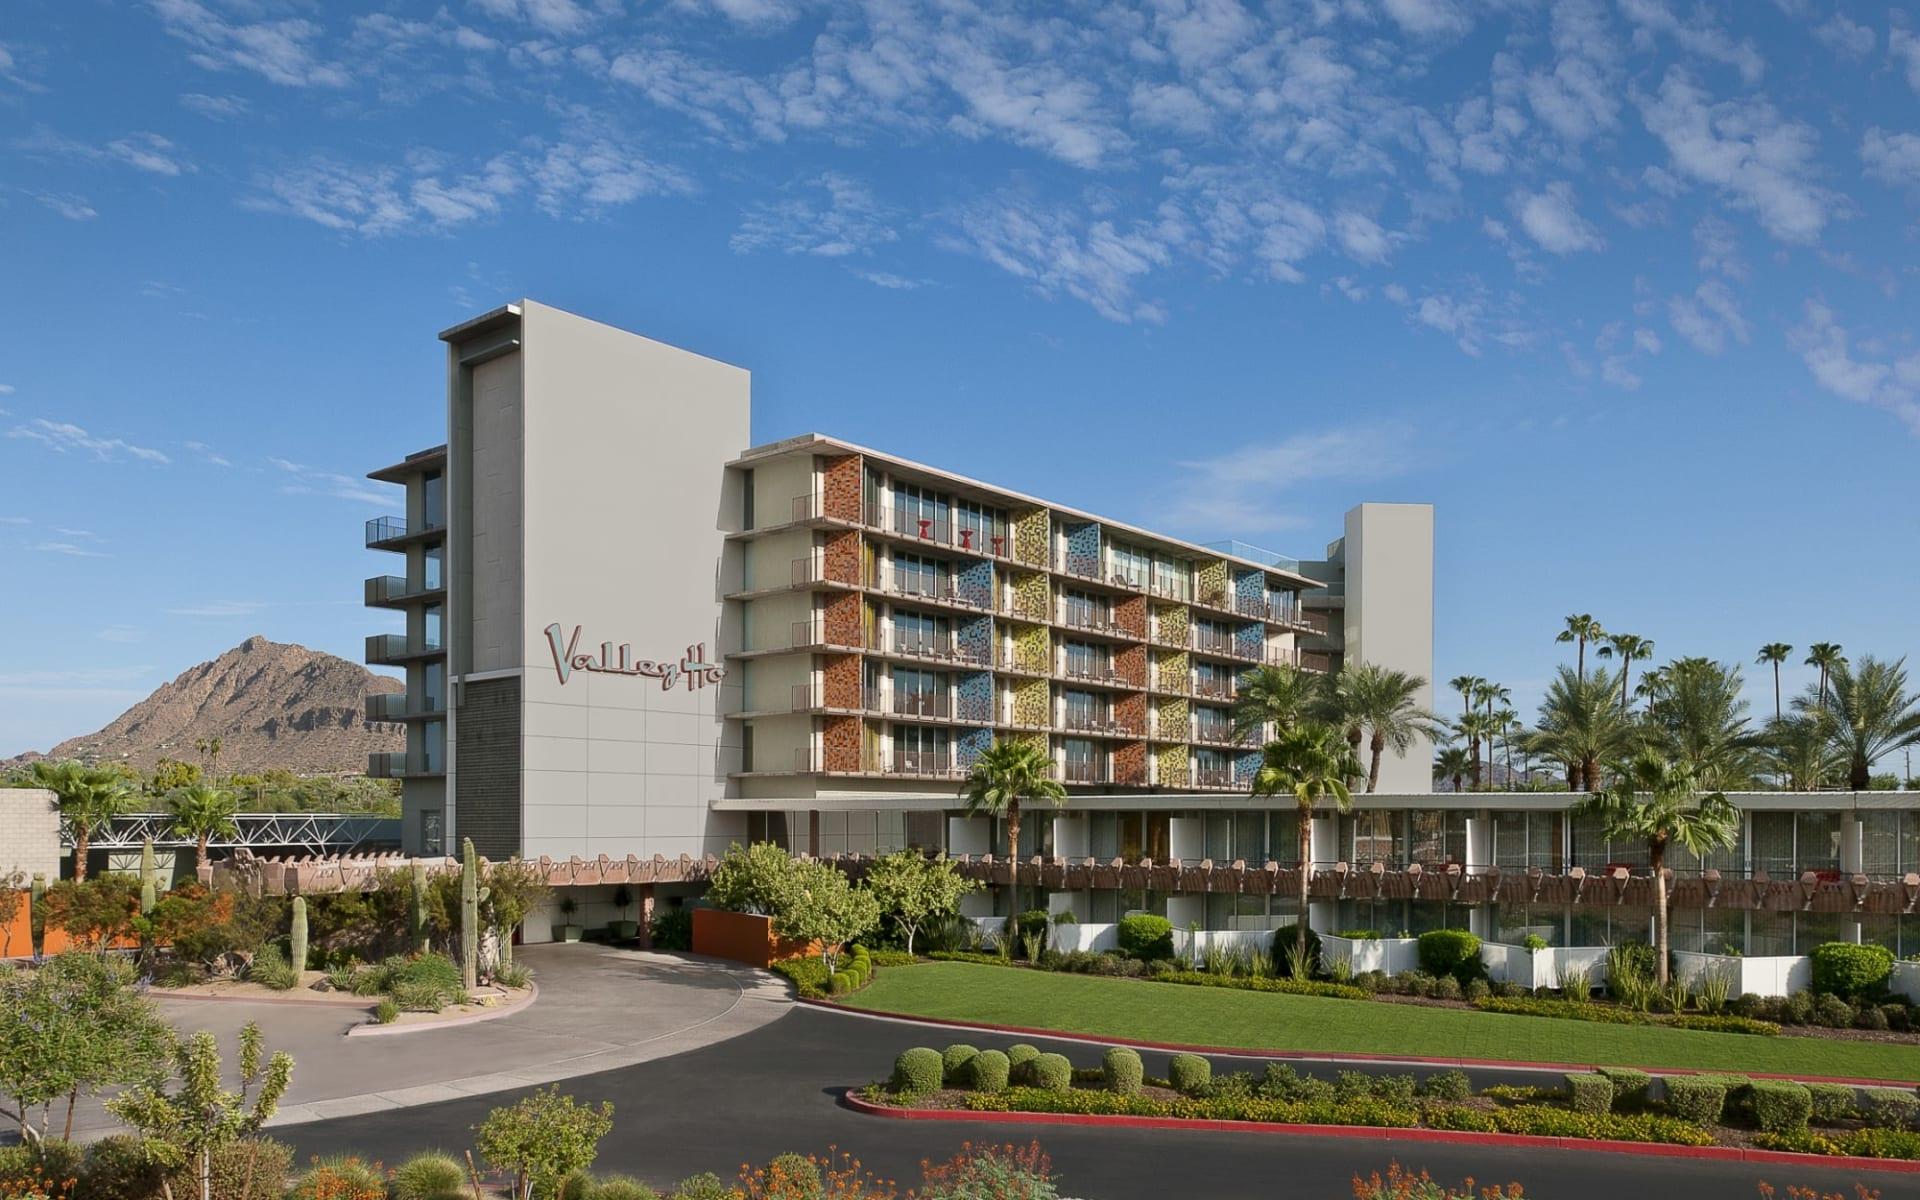 Hotel Valley Ho in Scottsdale: Hotel Valley Ho - Entrance